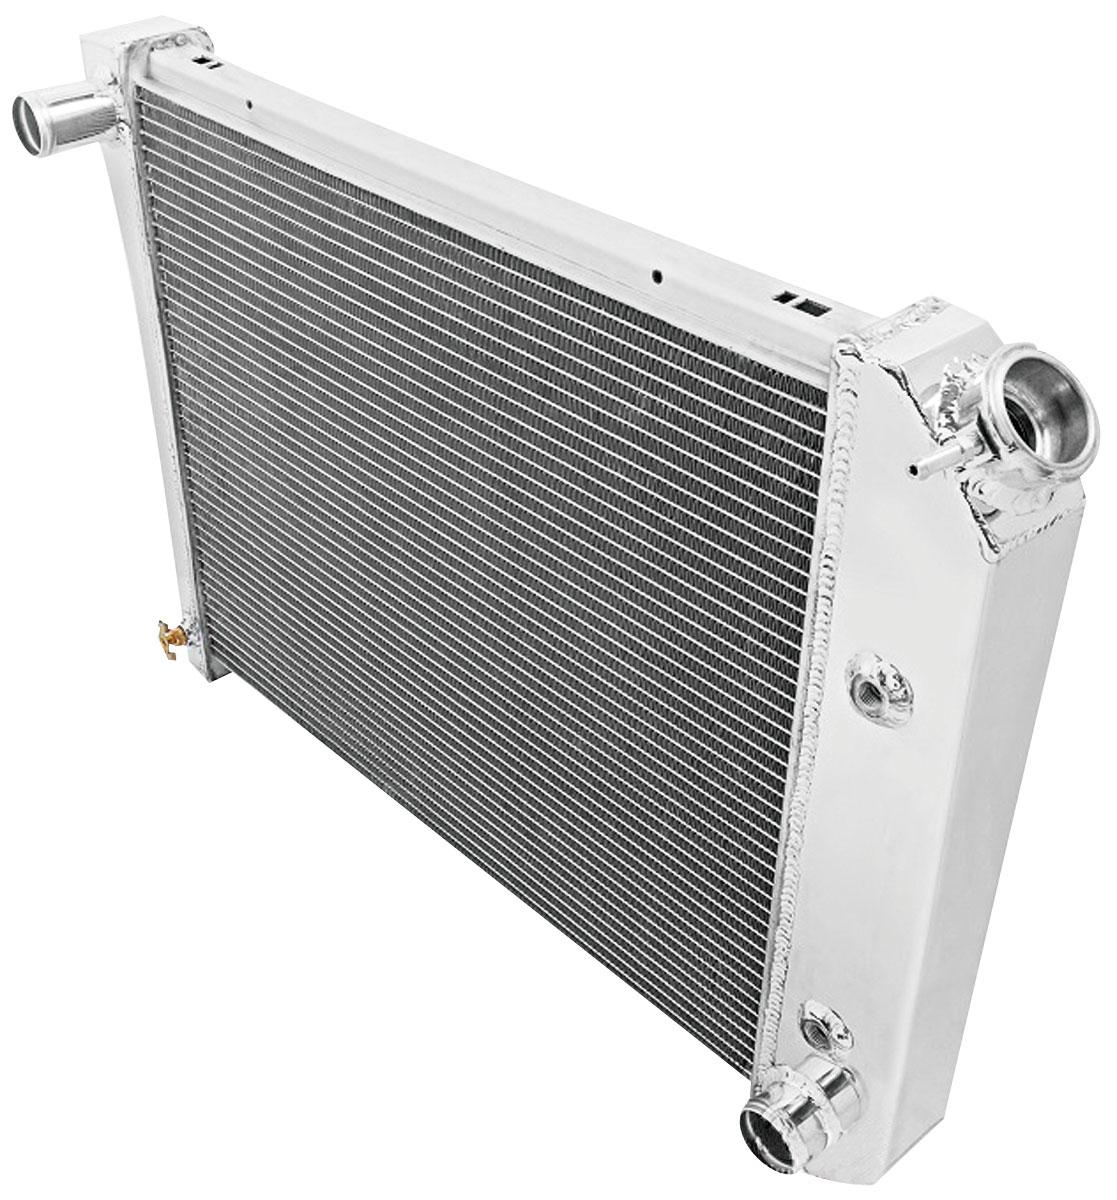 "Radiator, Alum. American Eagle, 68-88 Chevll/Monte/Regal, 64-9 Sky, 2Row 1"" Tube"